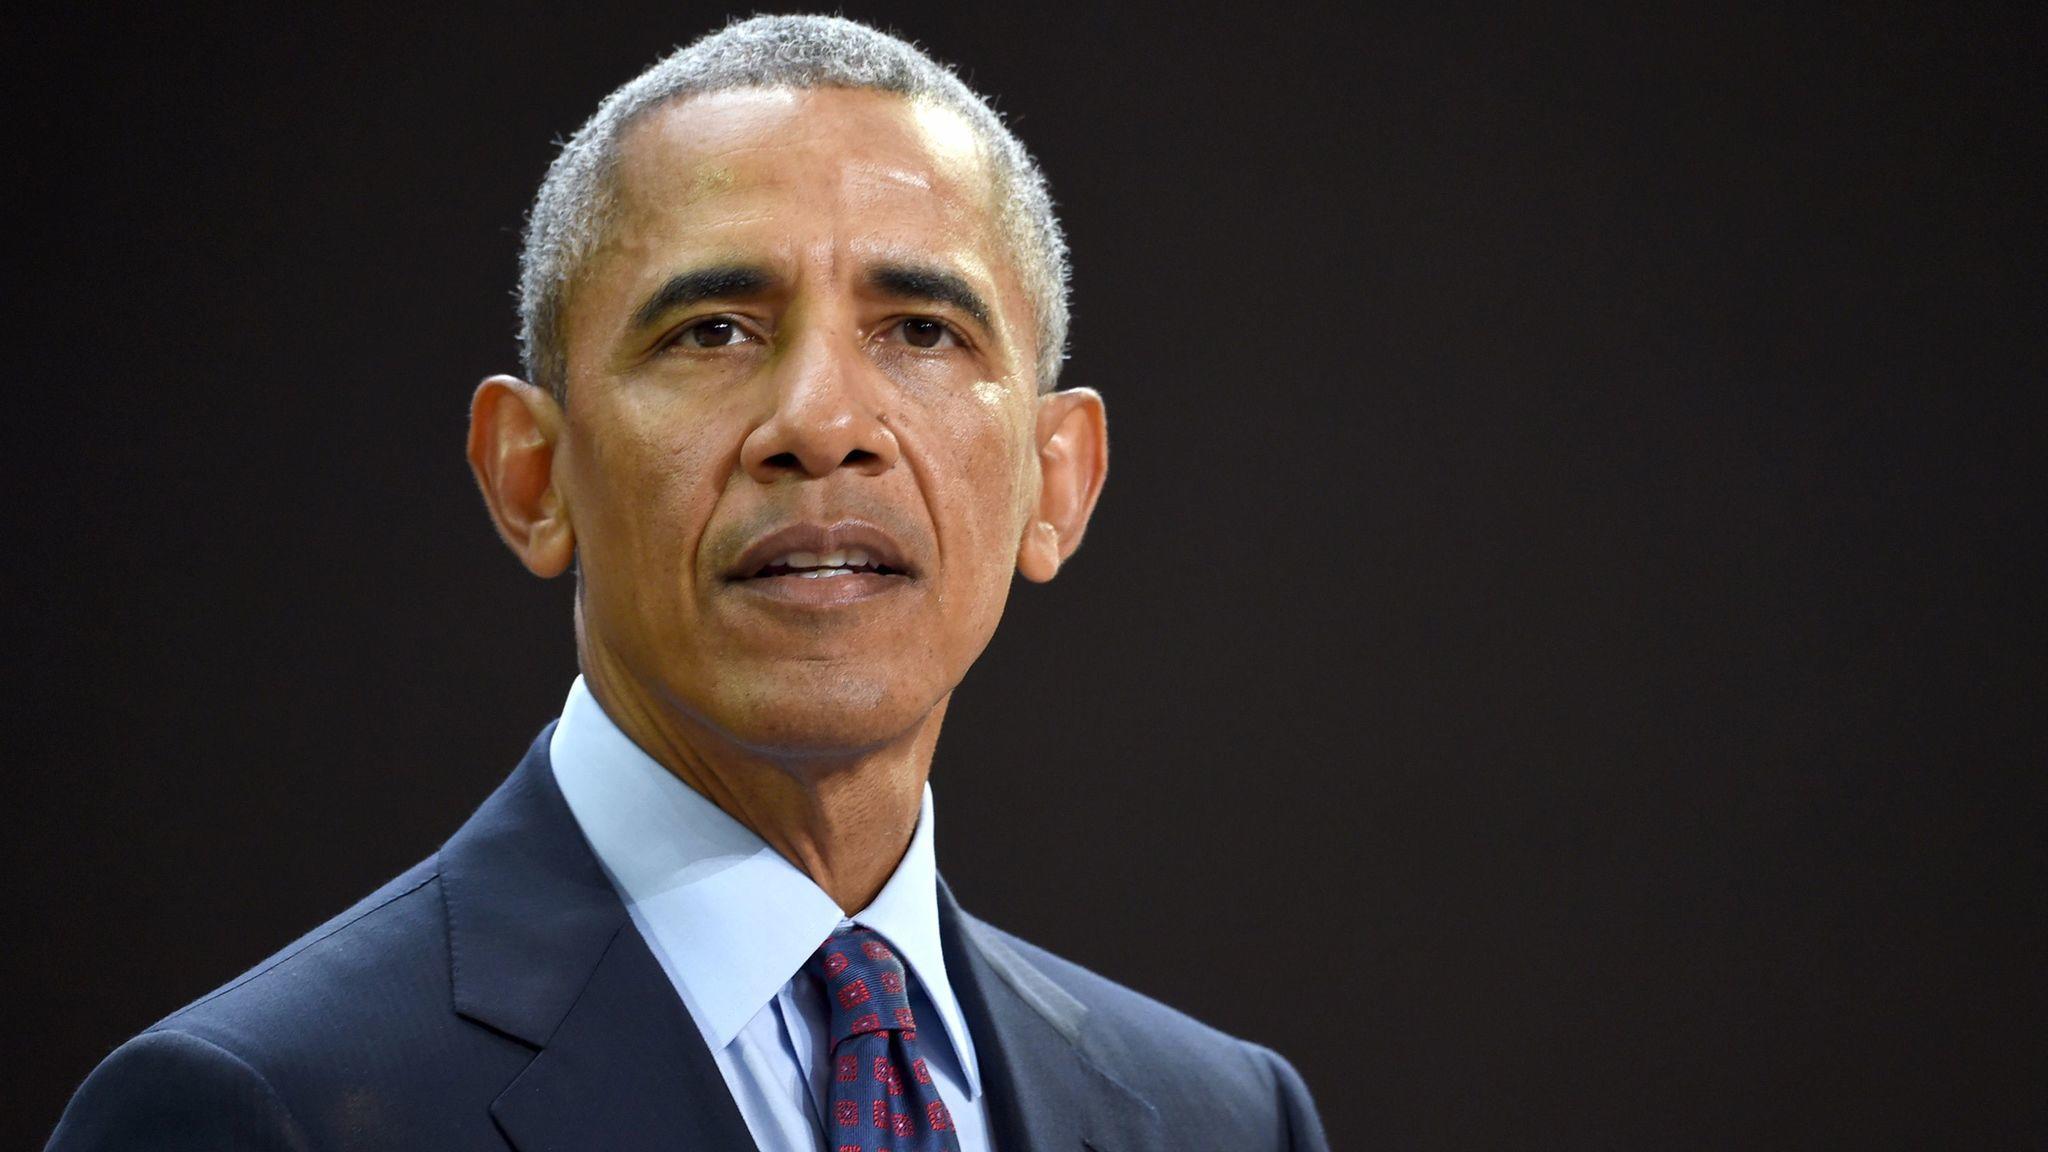 obama - photo #29